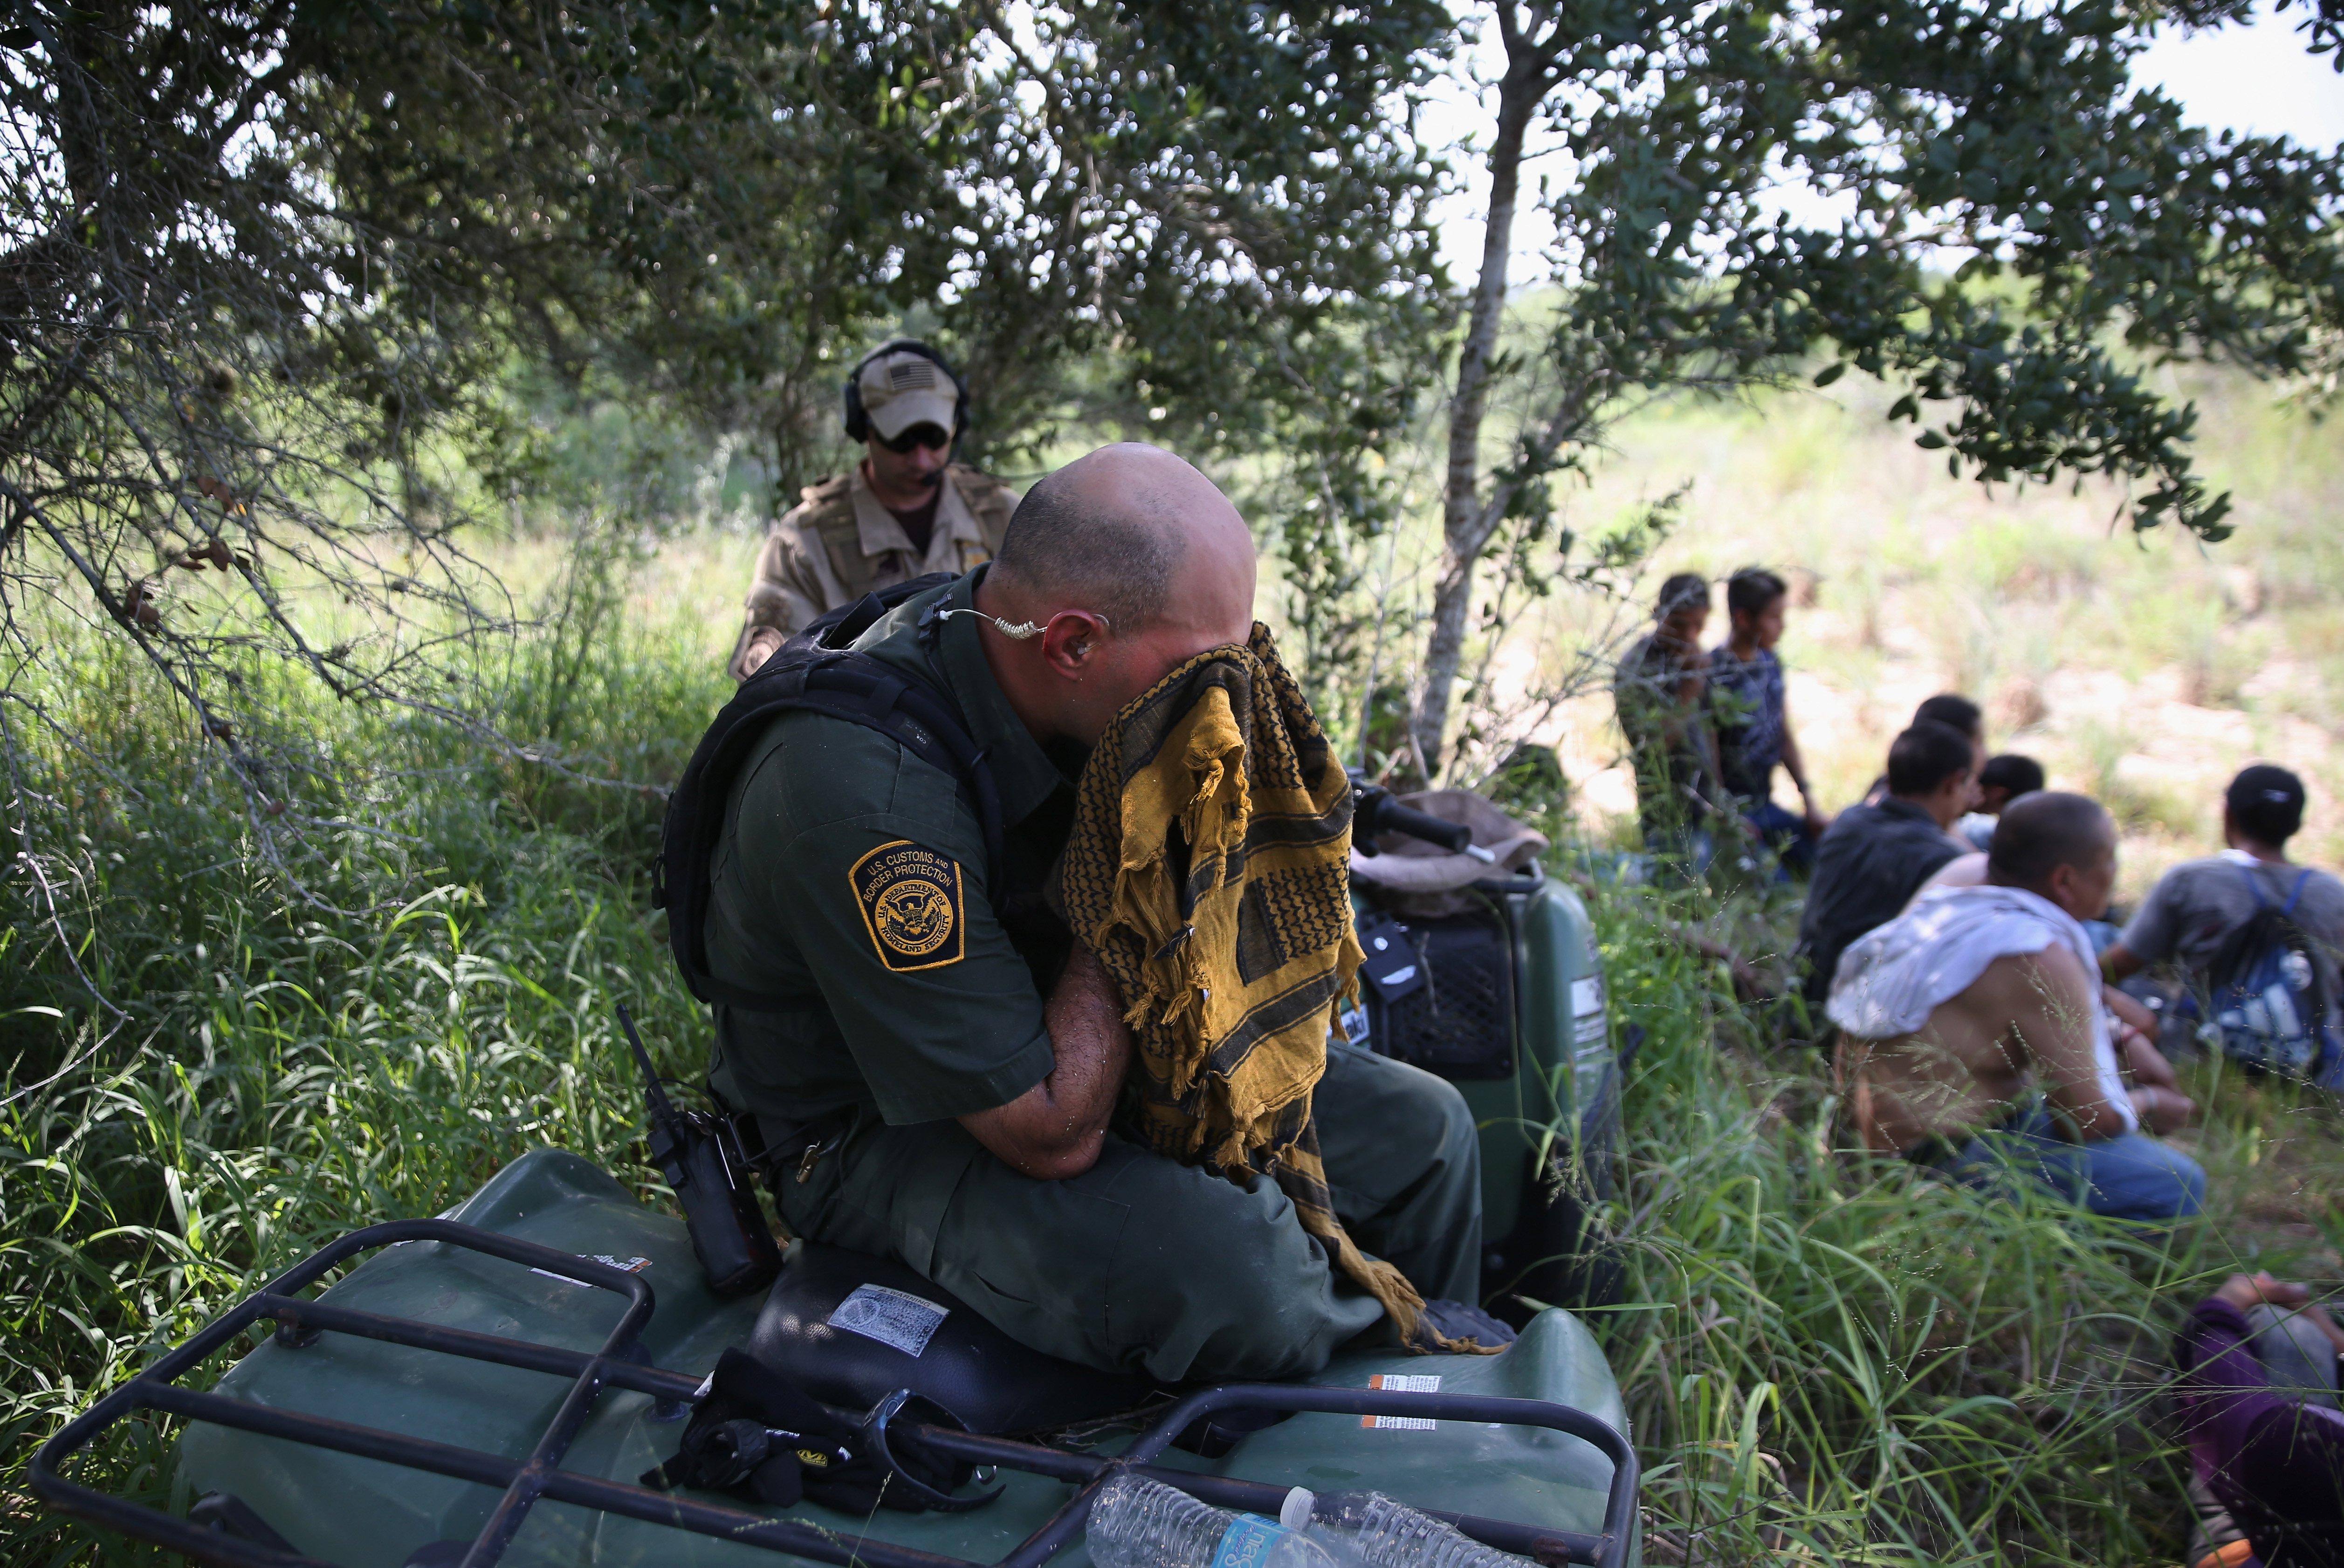 A U.S. Border Patrol agent endures the heat after taking undocumented immigrants into custody near Falfurrias, Texas on July 22, 2014.